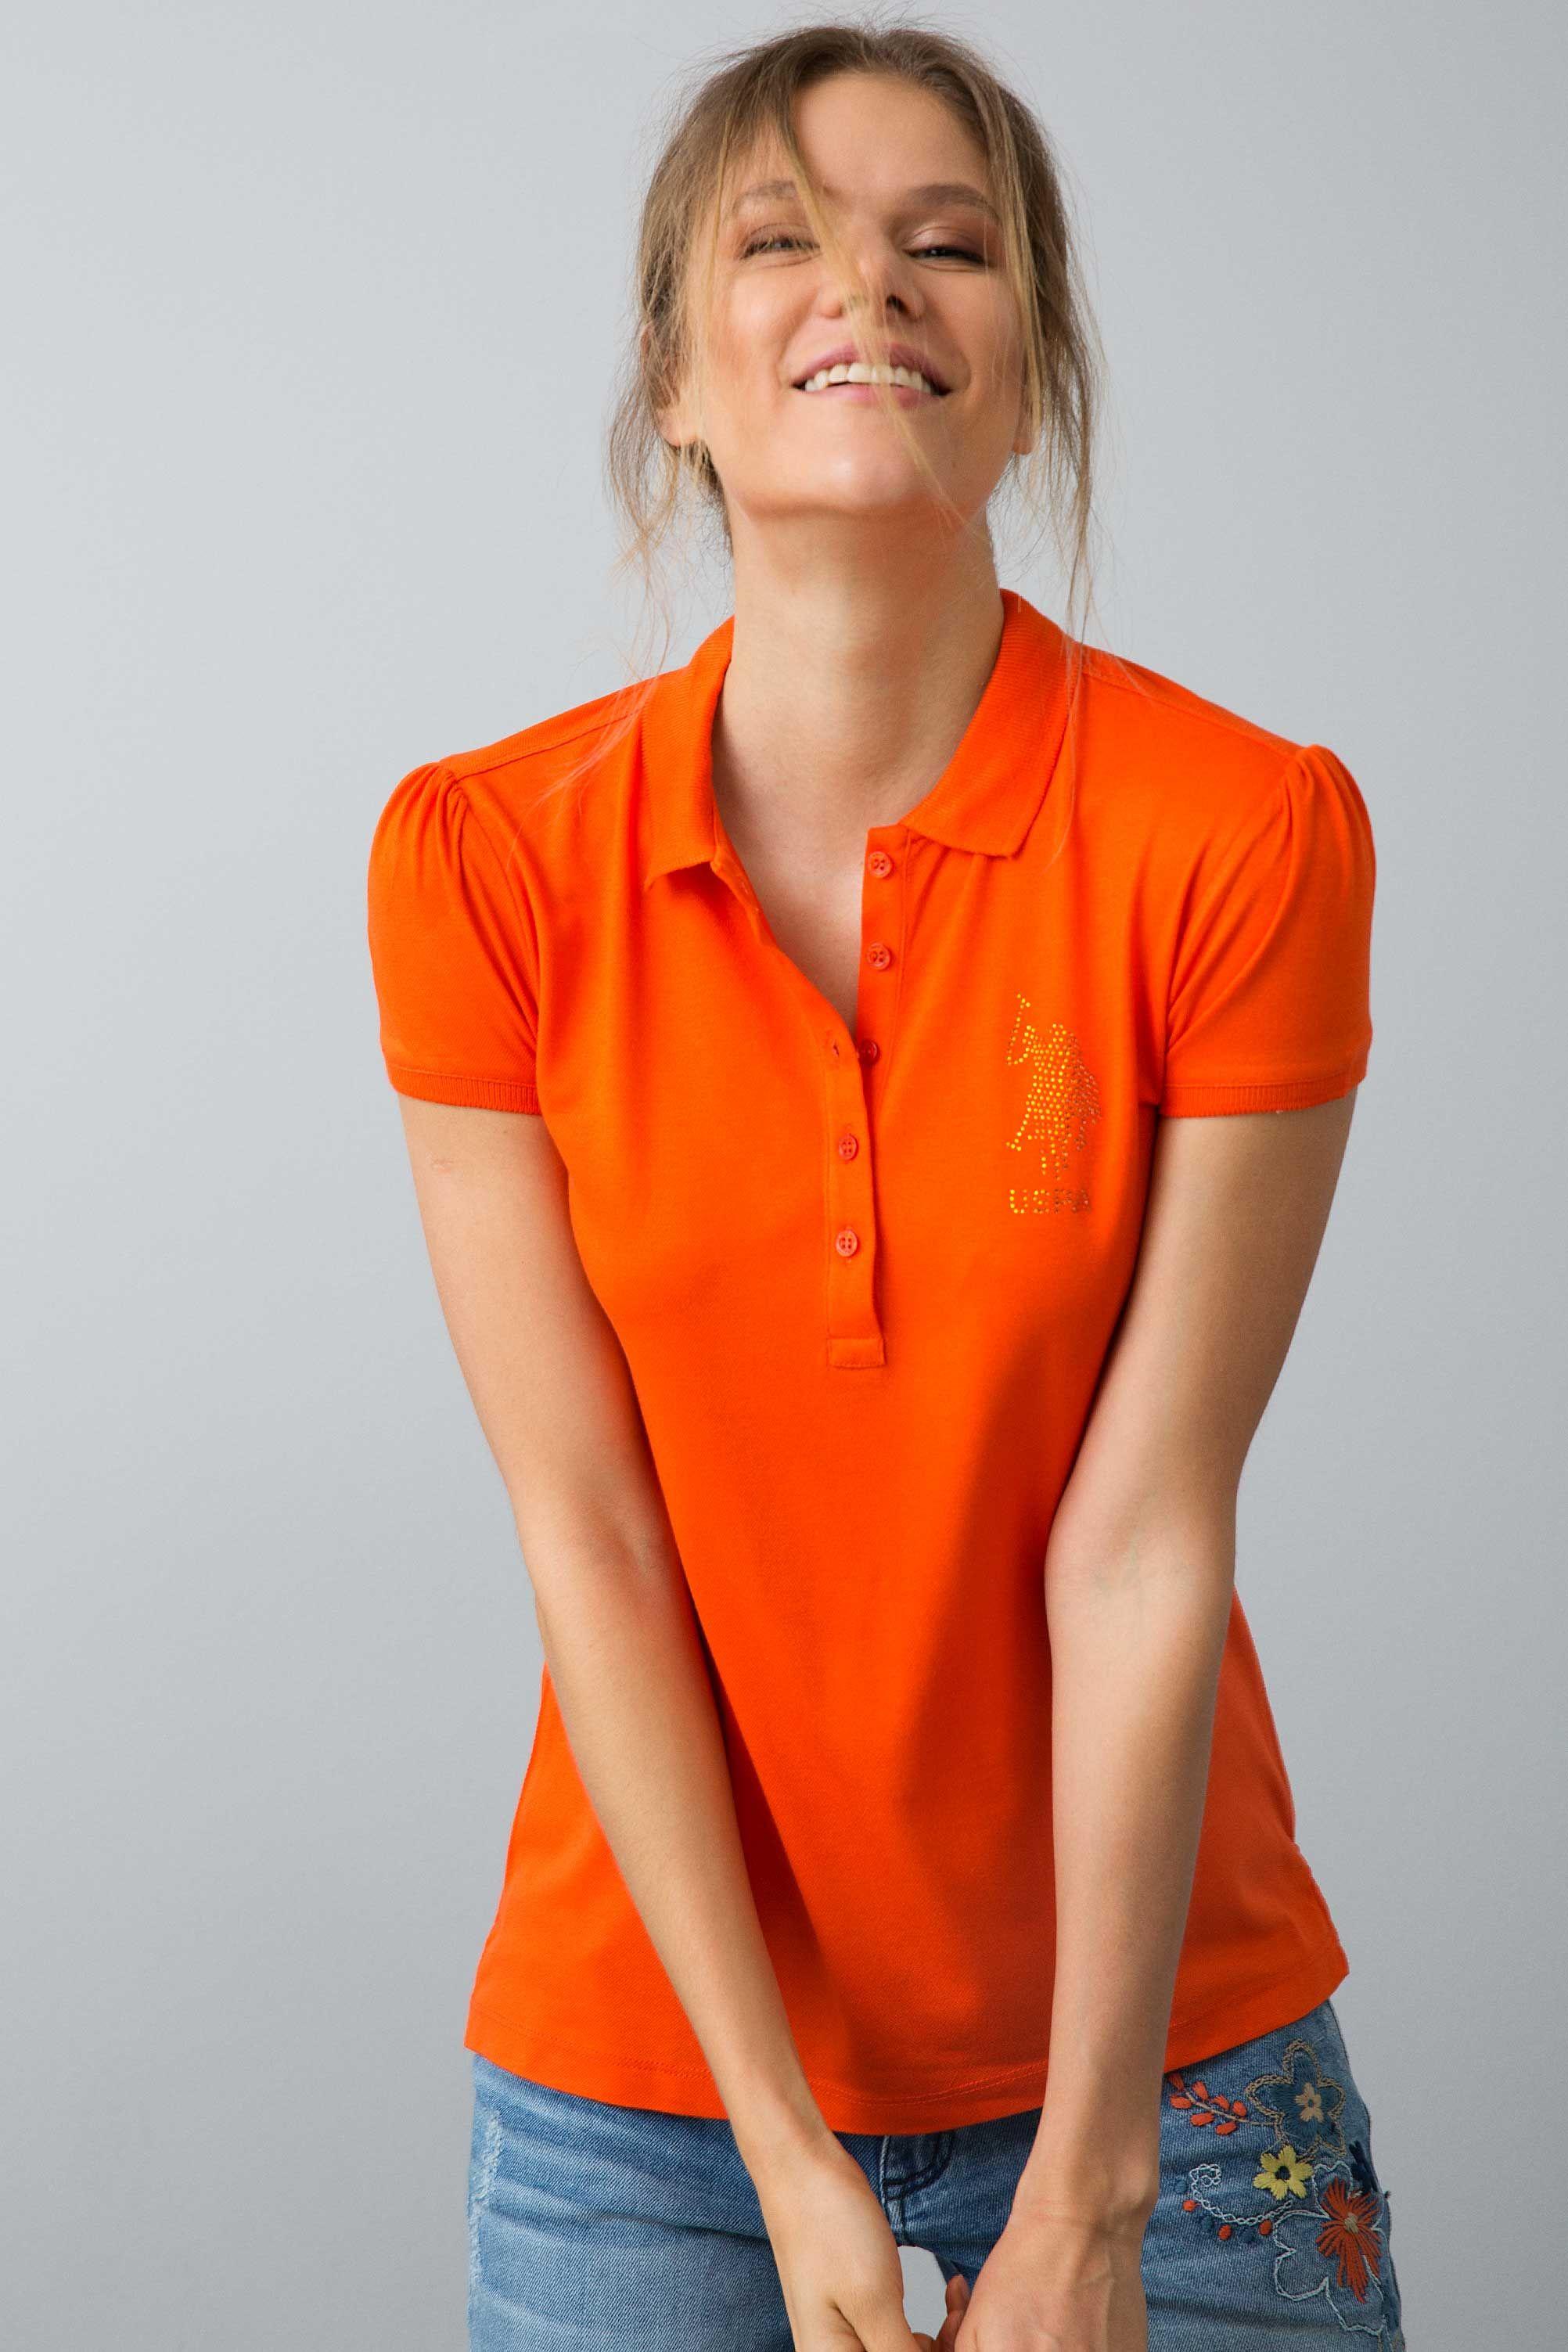 Kirmizi Kisa Kol Polo Yaka Slim Basic T Shirt Kadin Tisort Modelleri Ve Bayan Tshirt Fiyalari U S Polo Assn Kadin Tisort Tisort Modelleri Moda